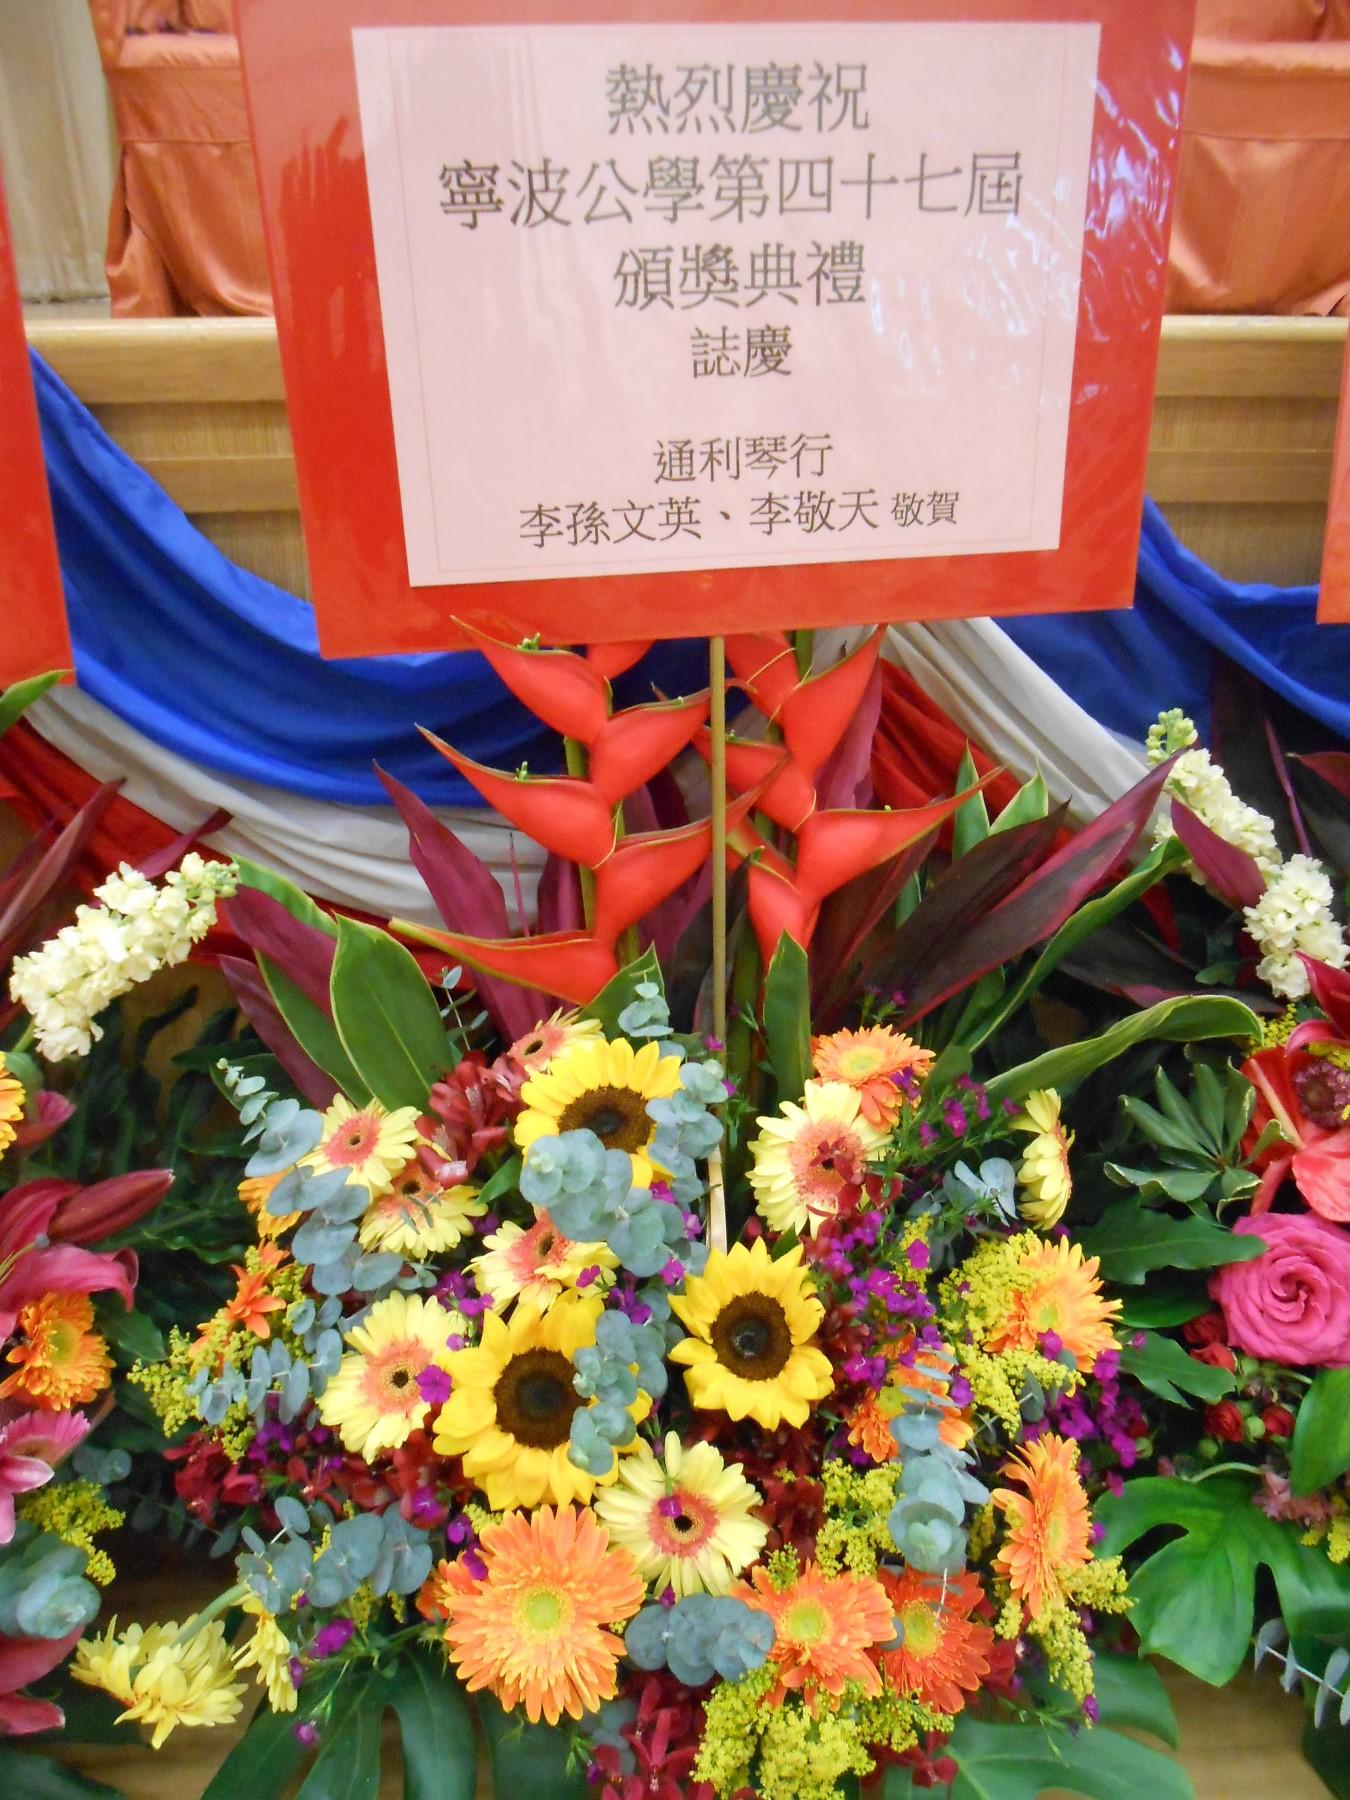 http://npc.edu.hk/sites/default/files/dscn9757.jpg